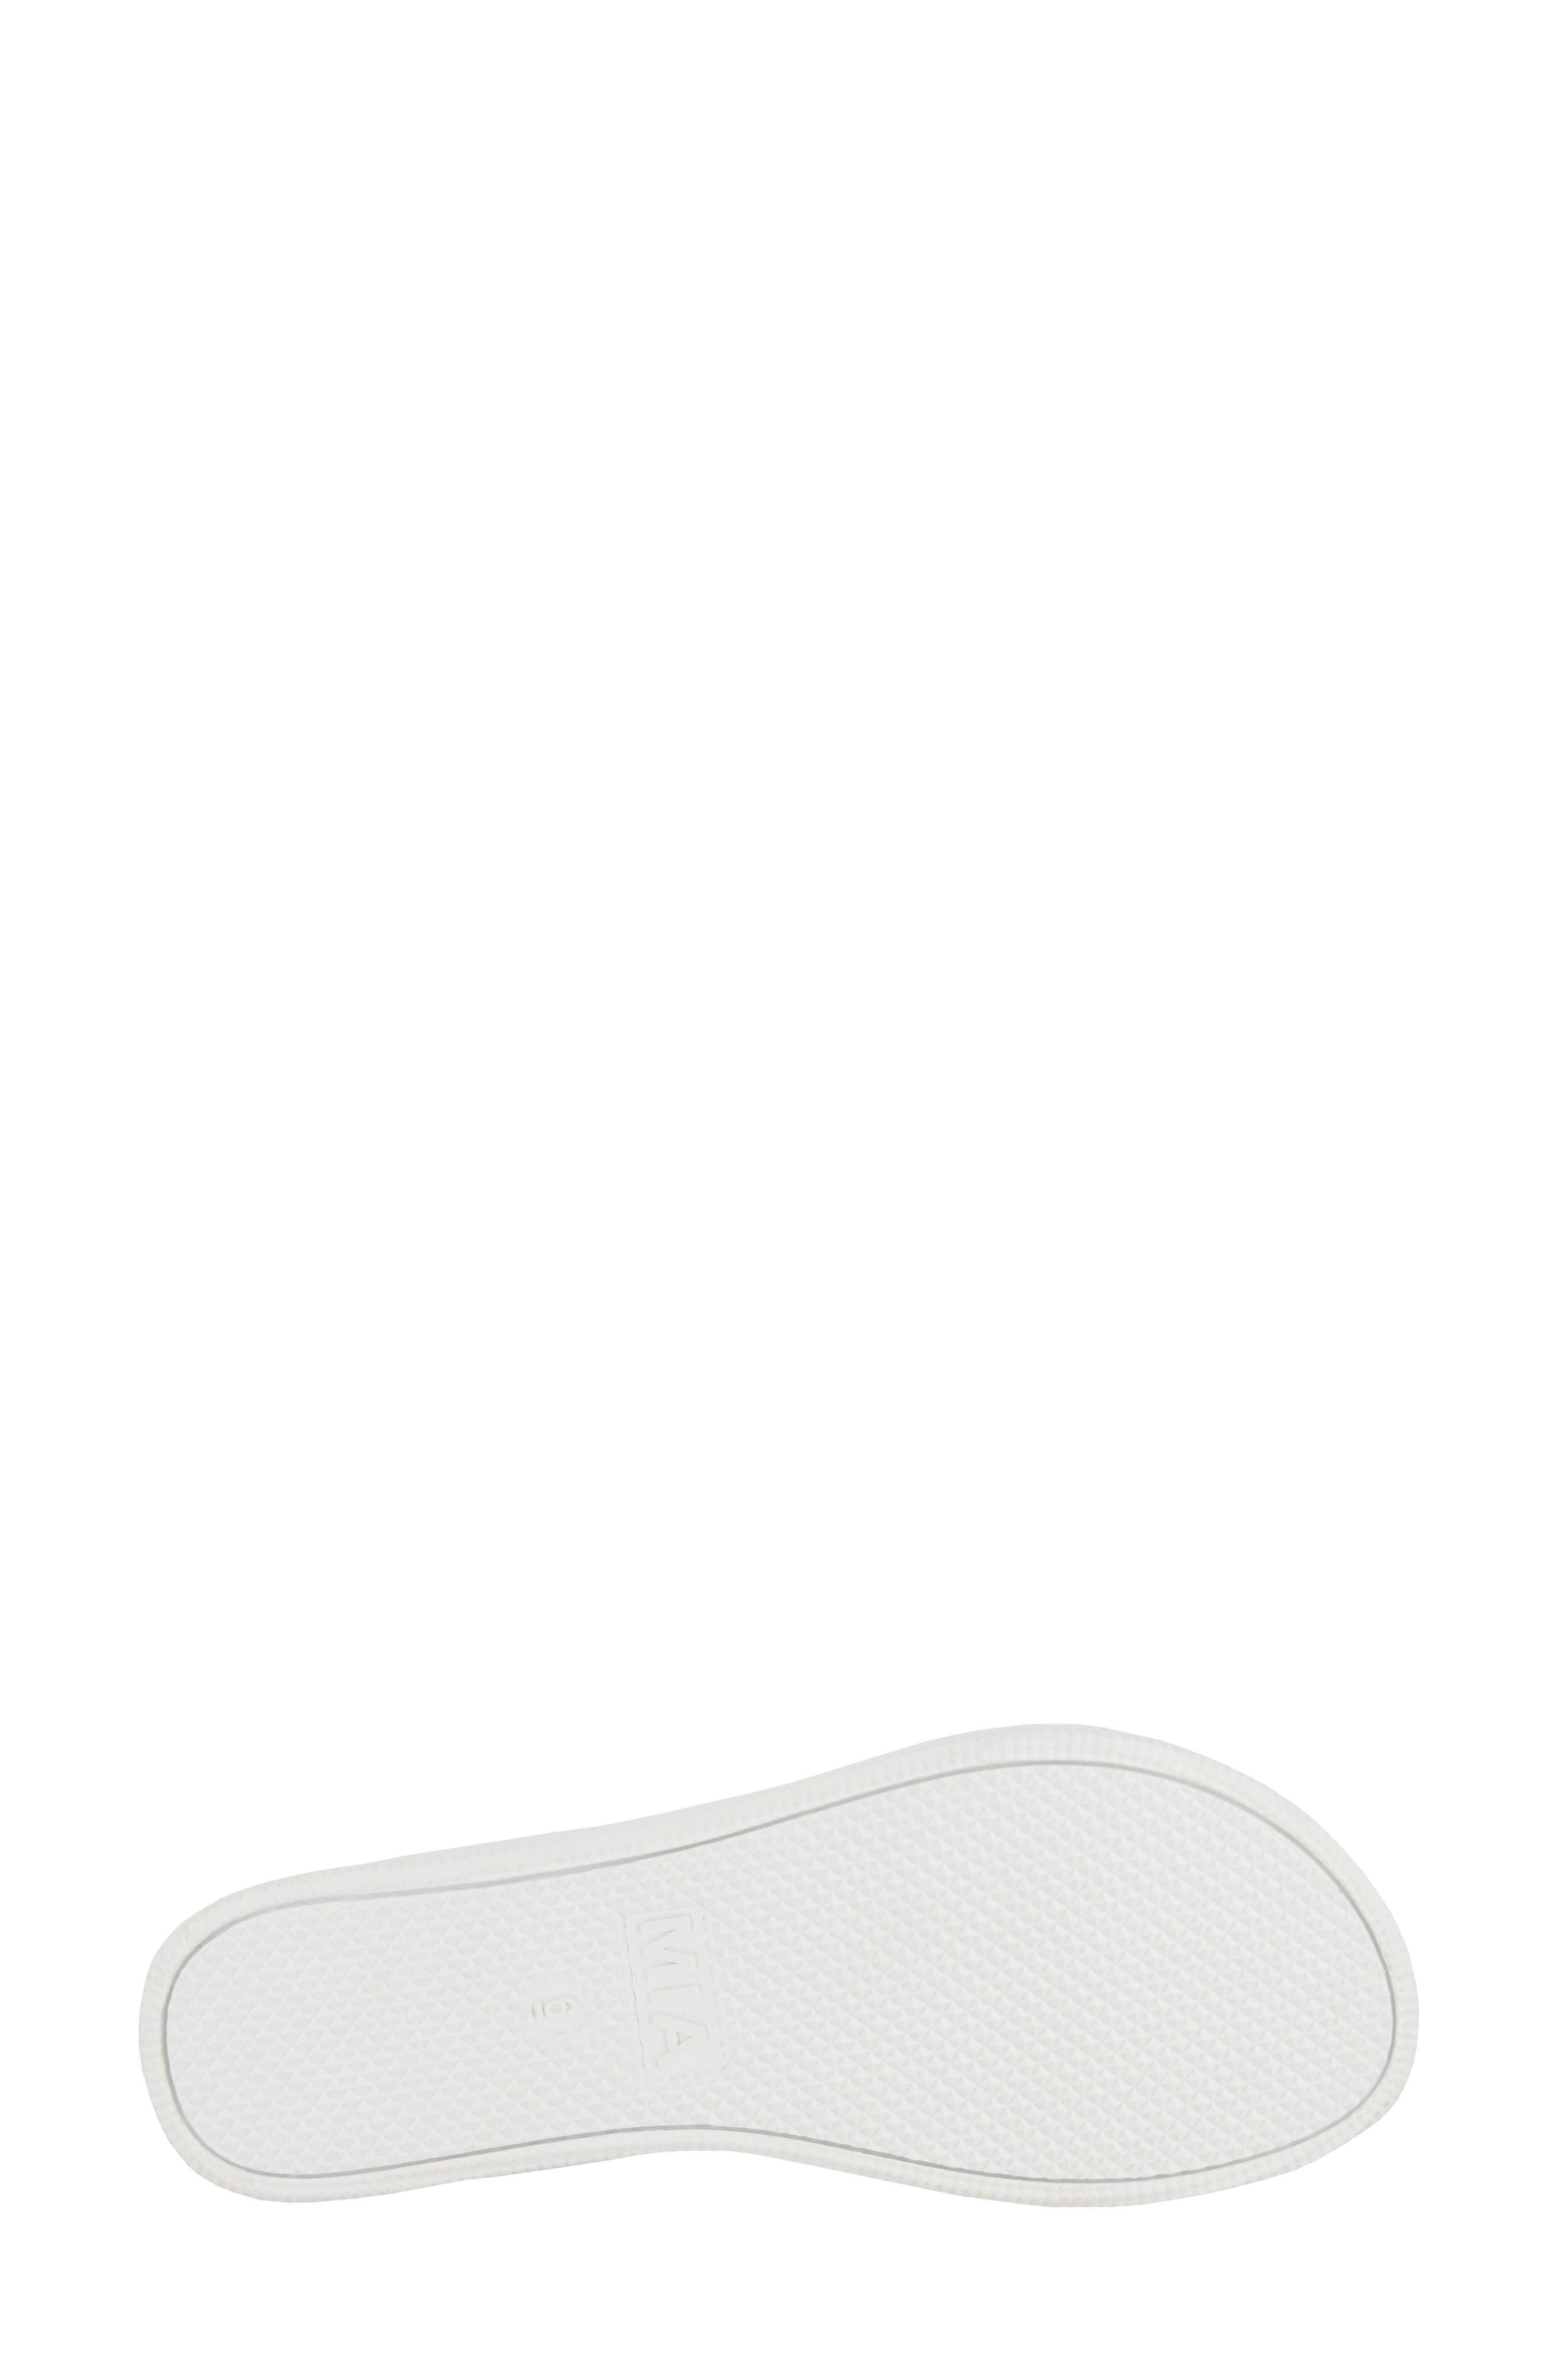 Venessa Platform Slide Sandal,                             Alternate thumbnail 6, color,                             001